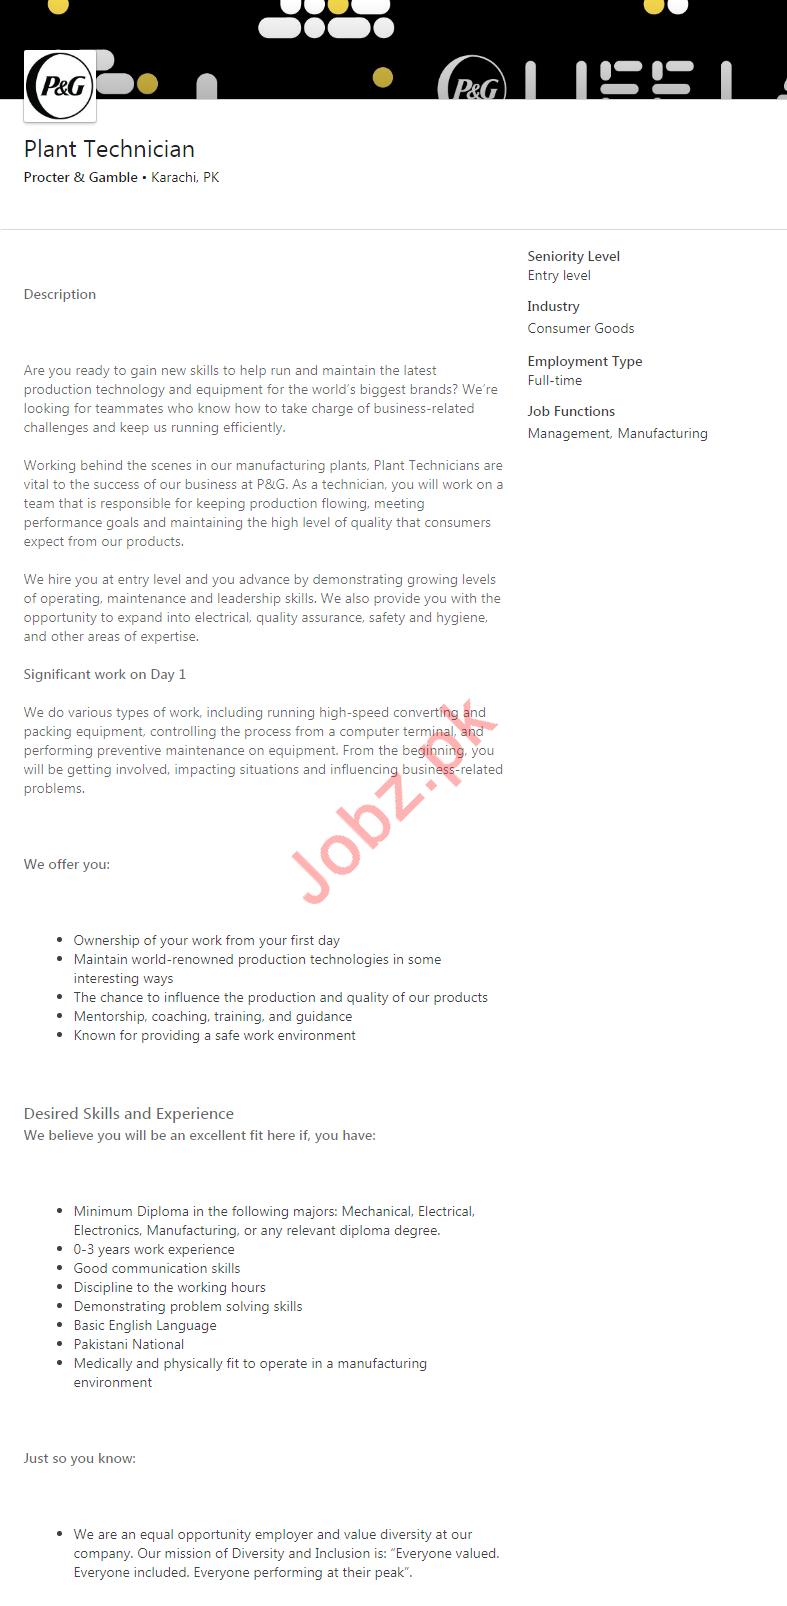 Plant Technician Job 2020 in Karachi